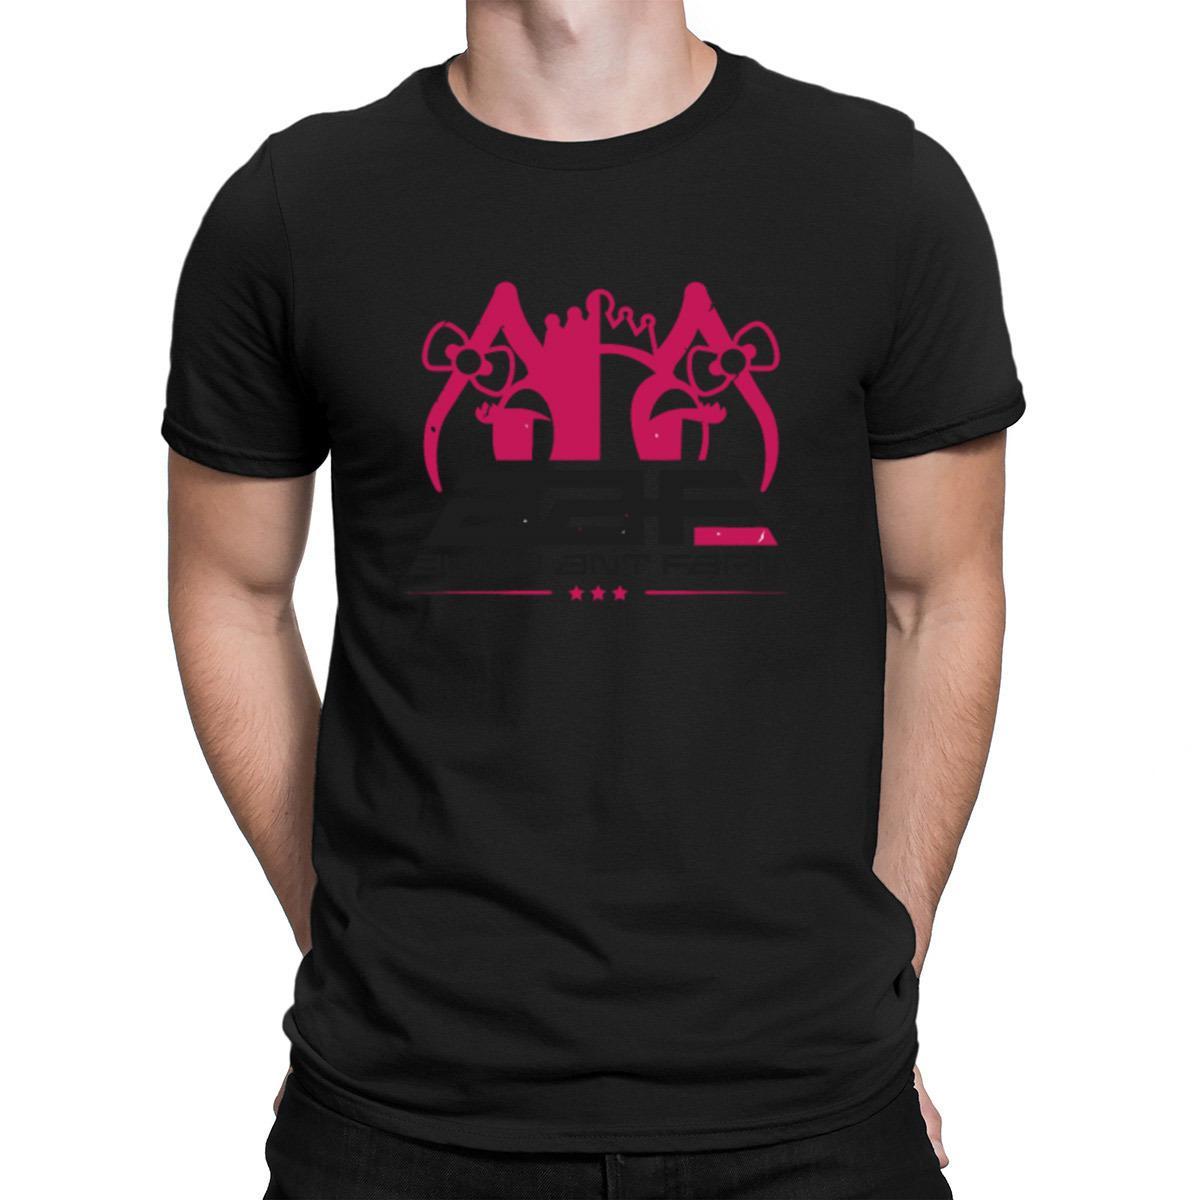 5eb11cec65 ... Farming Slogans For T Shirts DREAMWORKS Funny Farming Slogans For T  Shirts Source · Farming Farmer Tractor T Shirt Slogan Fendt Case Claas New  Holland